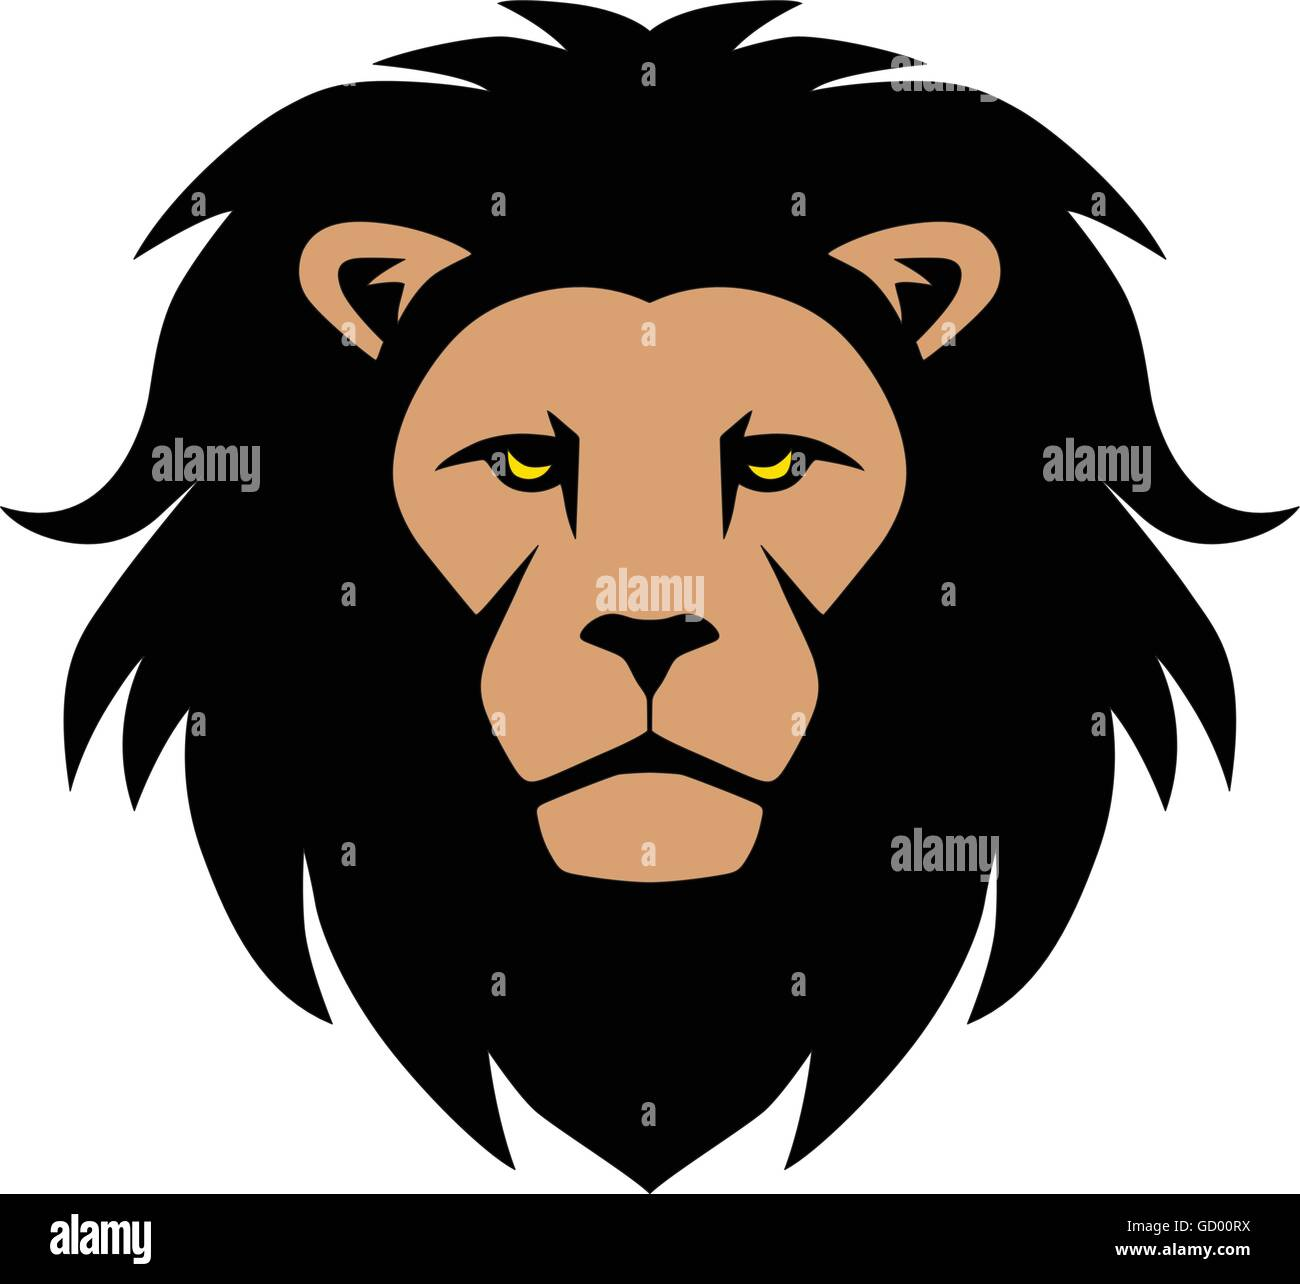 cartoon lions head stock photos cartoon lions head stock images rh alamy com cartoon lion head clip art cartoon lion head outline